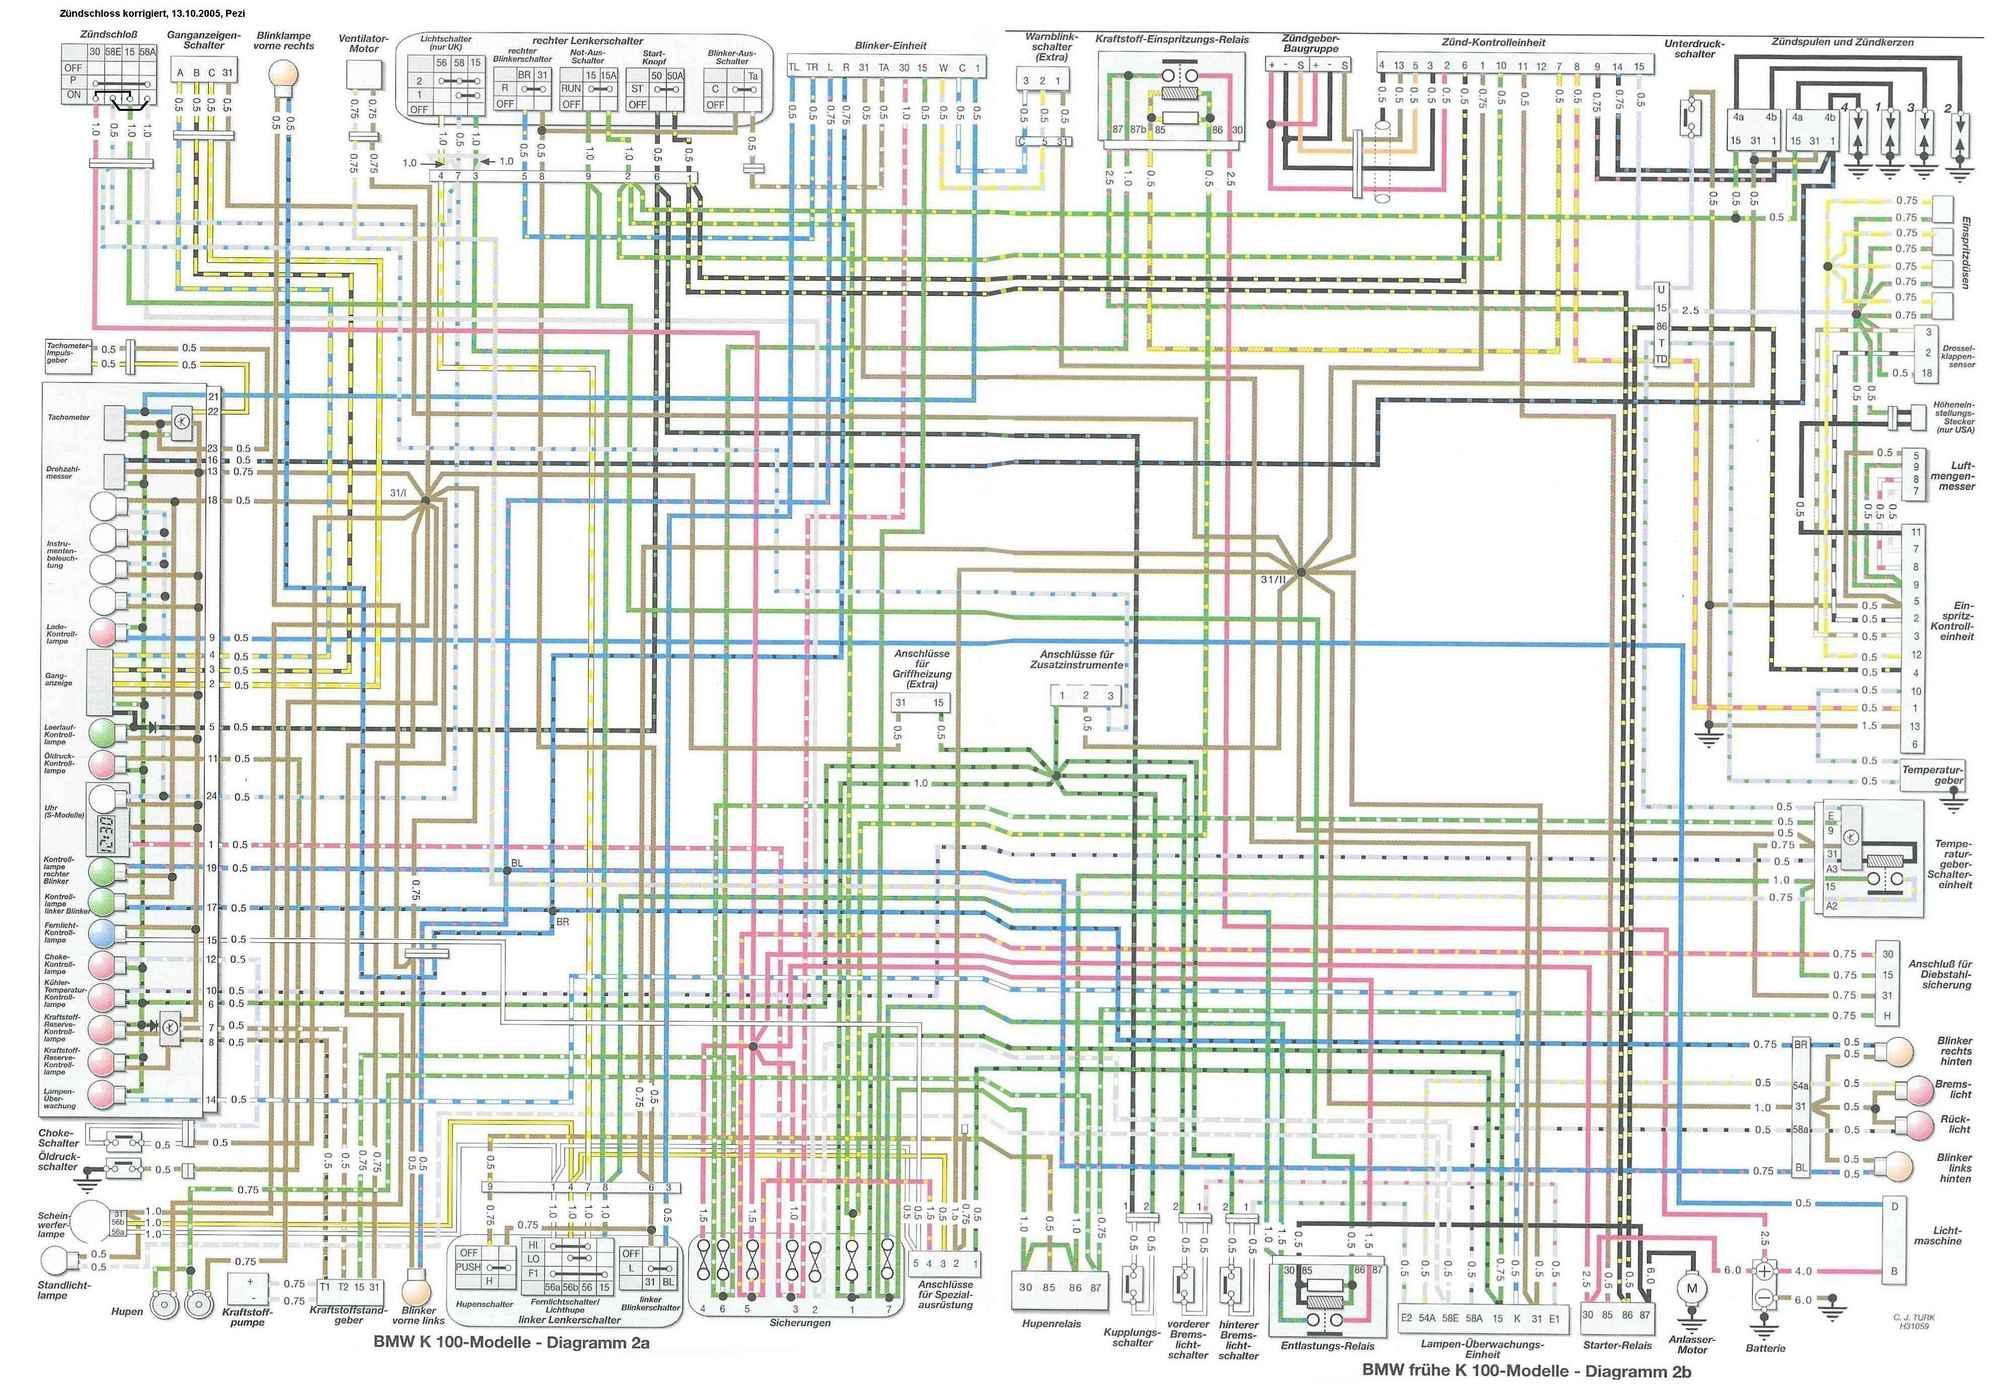 e46 wiring diagram pdf e46 radio wiring diagram wiring